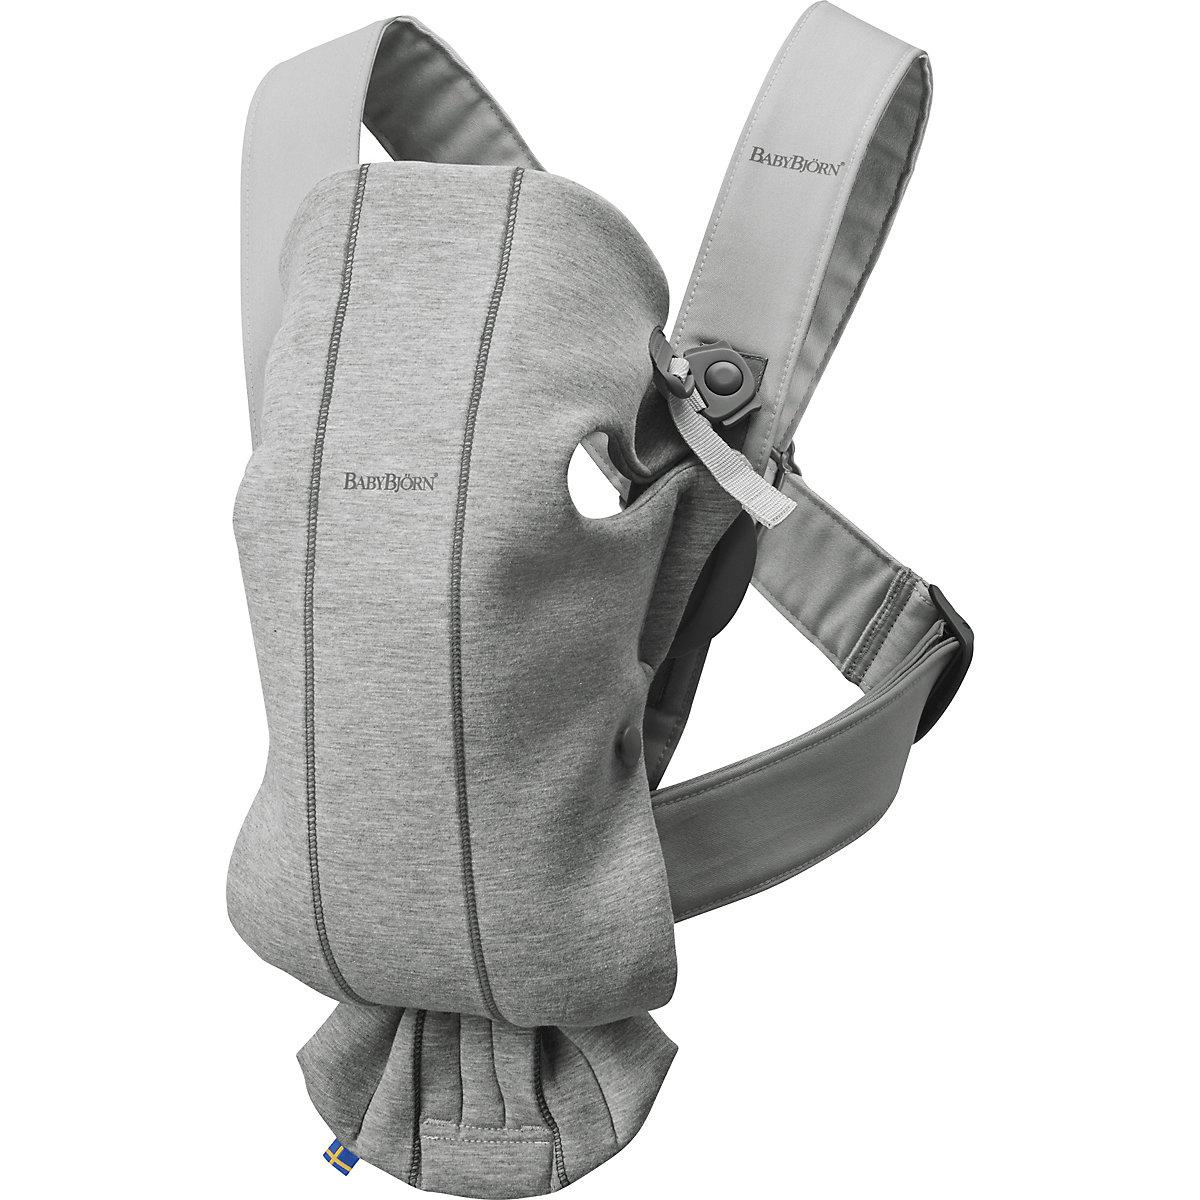 BABYBJORN Backpacks & Carriers 8584420 Backpack Carrier Slings Kangaroo For Boy And Girl